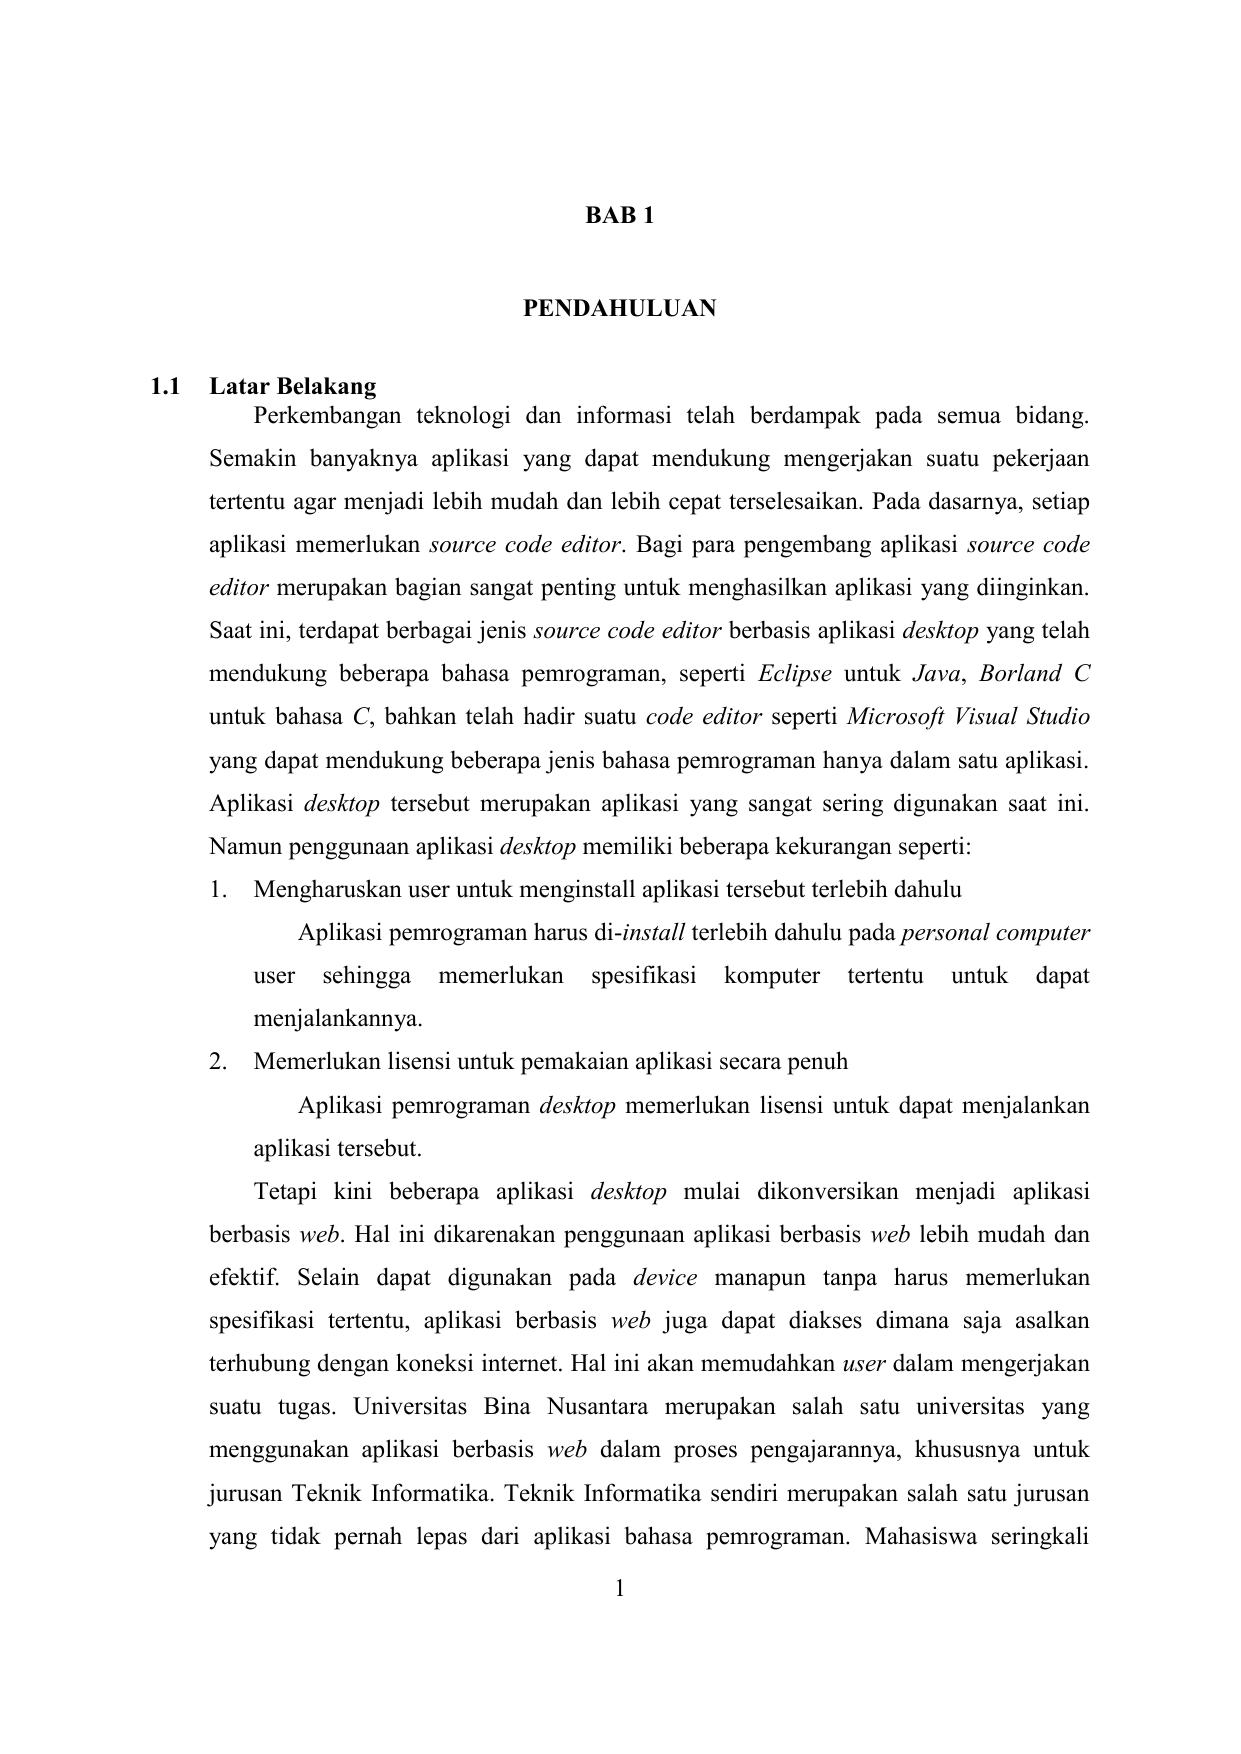 Contoh Proposal Skripsi Binus Pejuang Skripsi